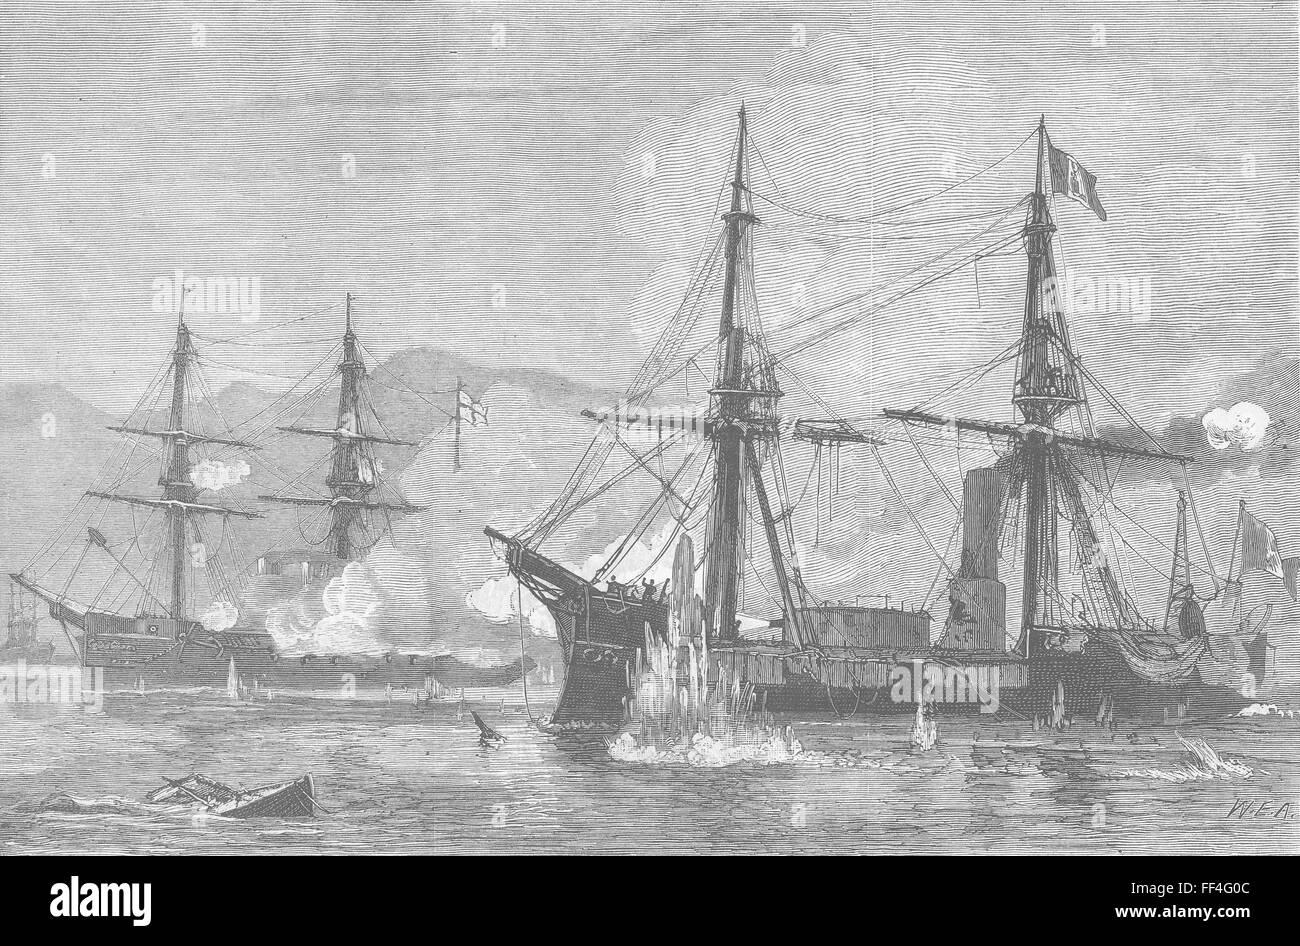 PERU Battle between Huascar & HMS Shah, Ilo 1879. The Graphic - Stock Image